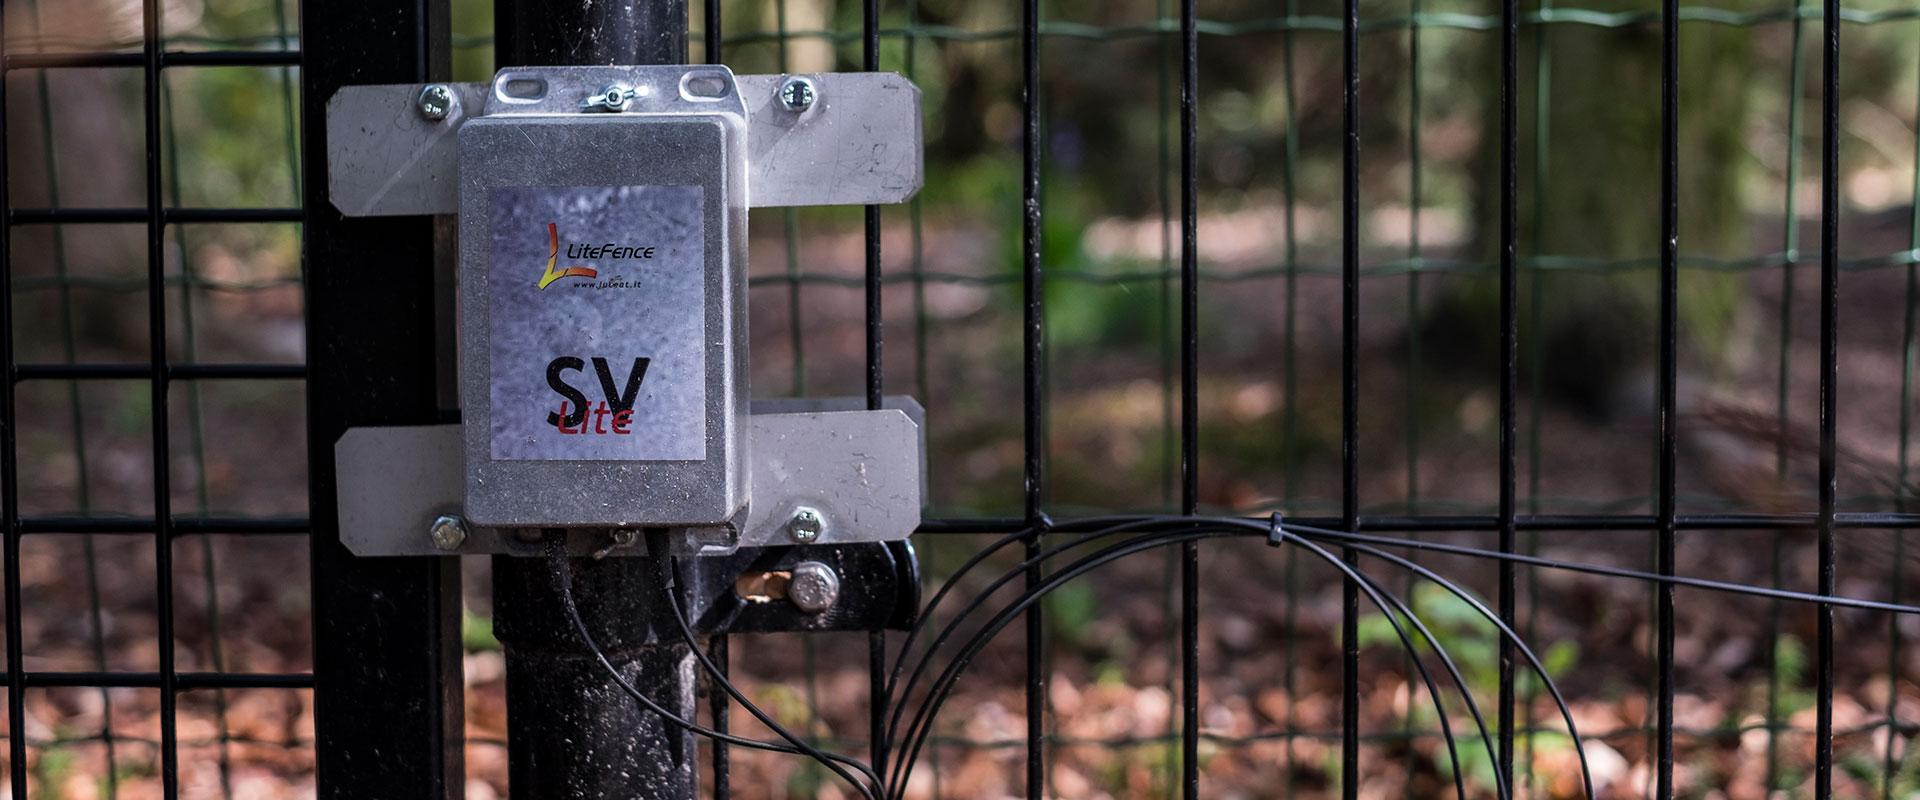 Defendum Smart Security | Toegangscontrole plaatsen te Temse & Sint-Niklaas